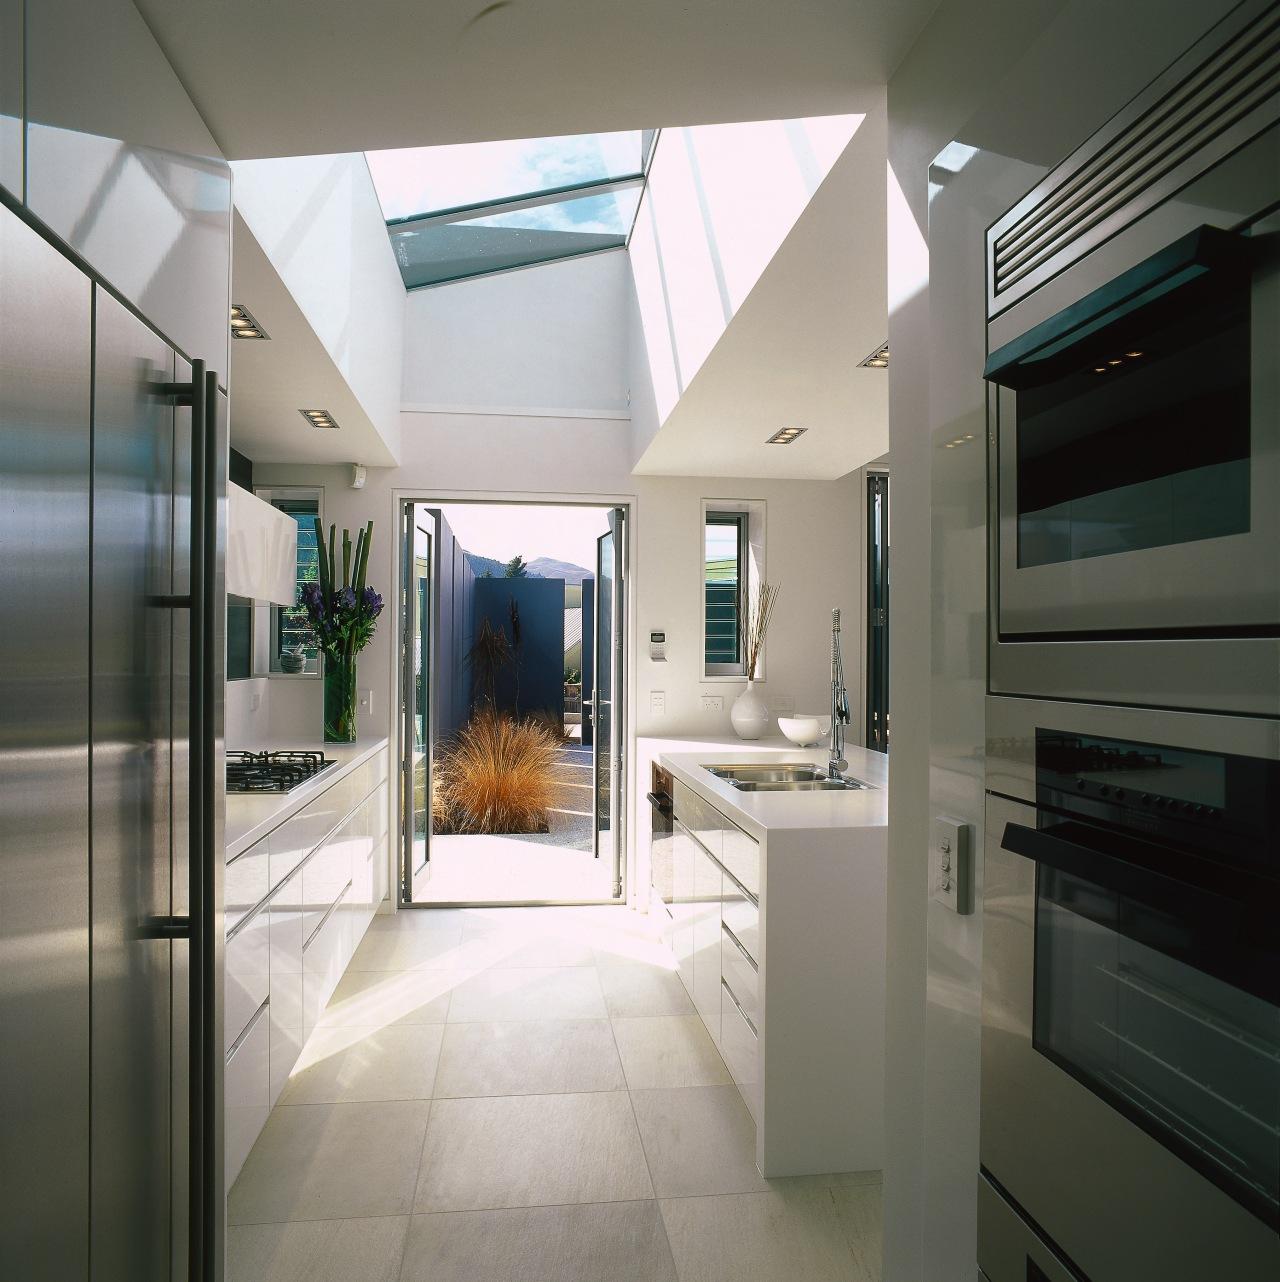 A view of the kitchen area, concrete tiled interior design, gray, black